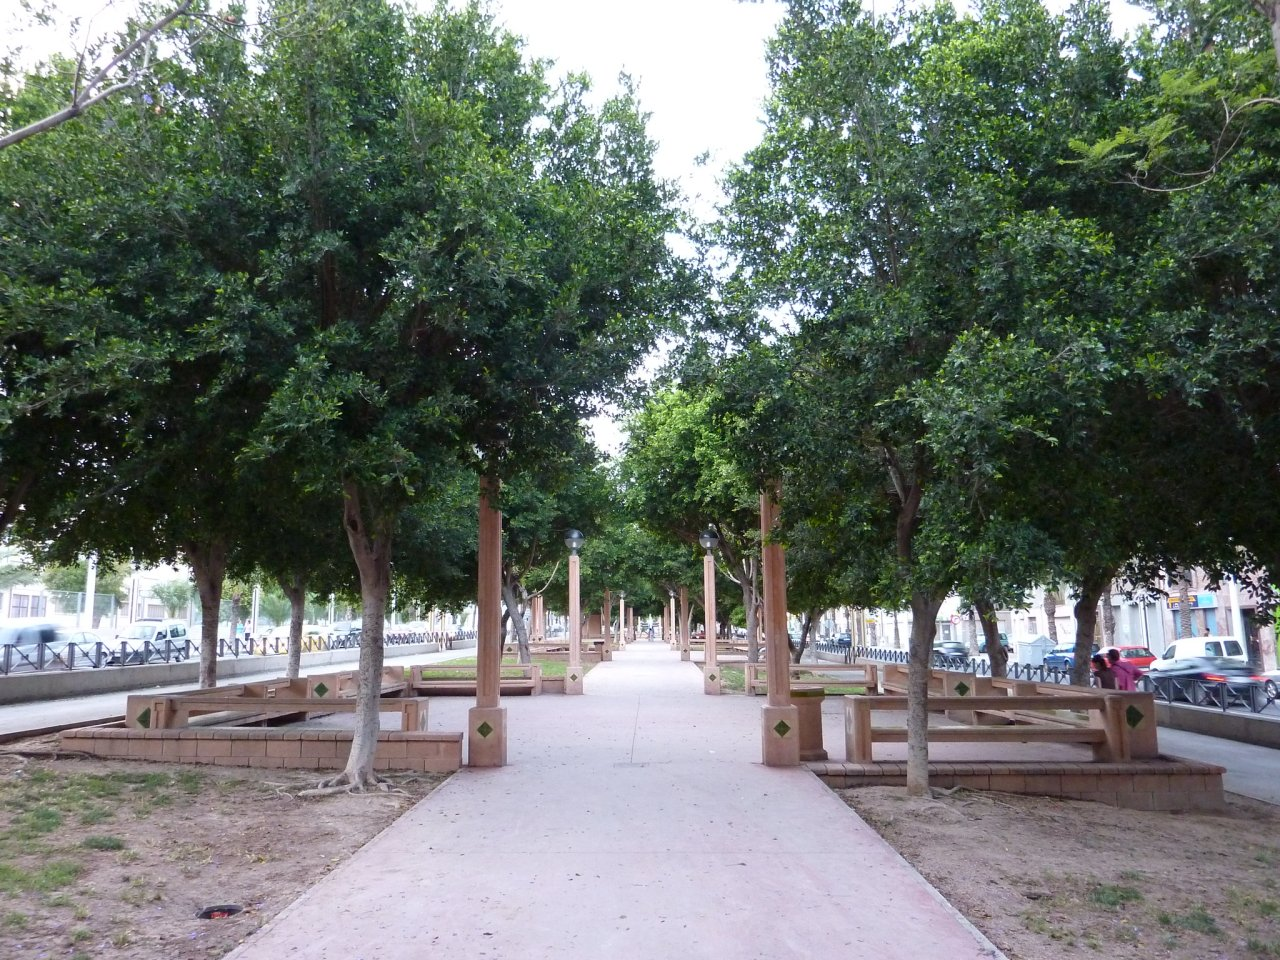 Park in Elche, Spain